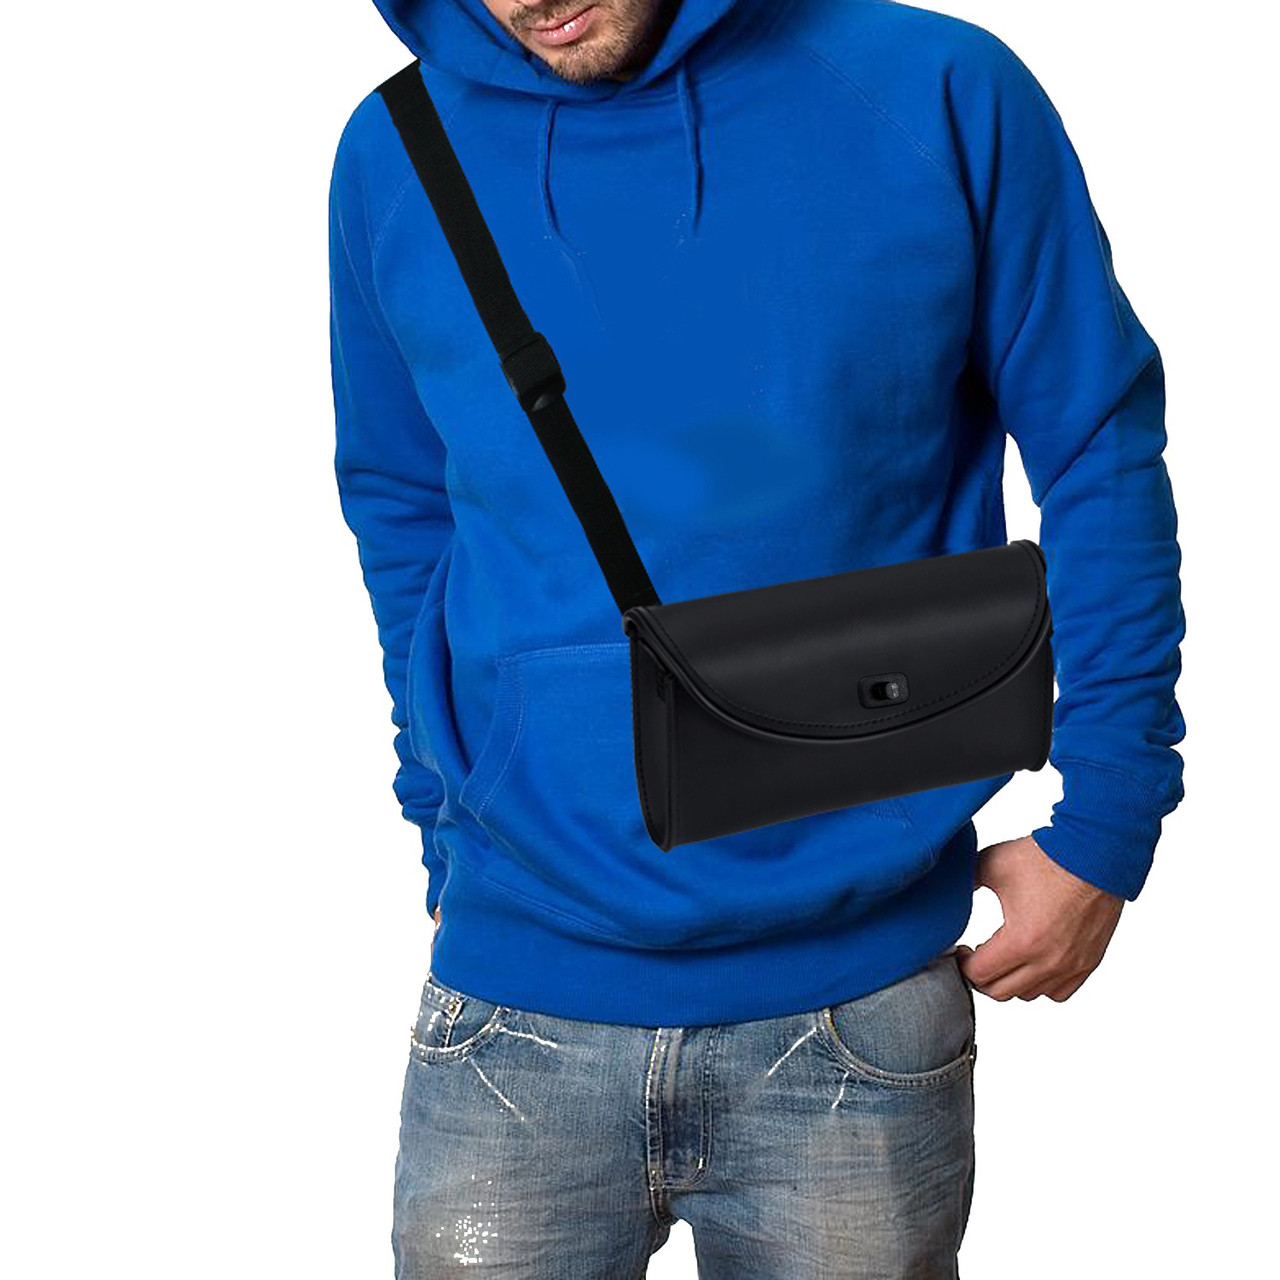 Large Detachable Motorcycle Windshield Bag on shoulder View